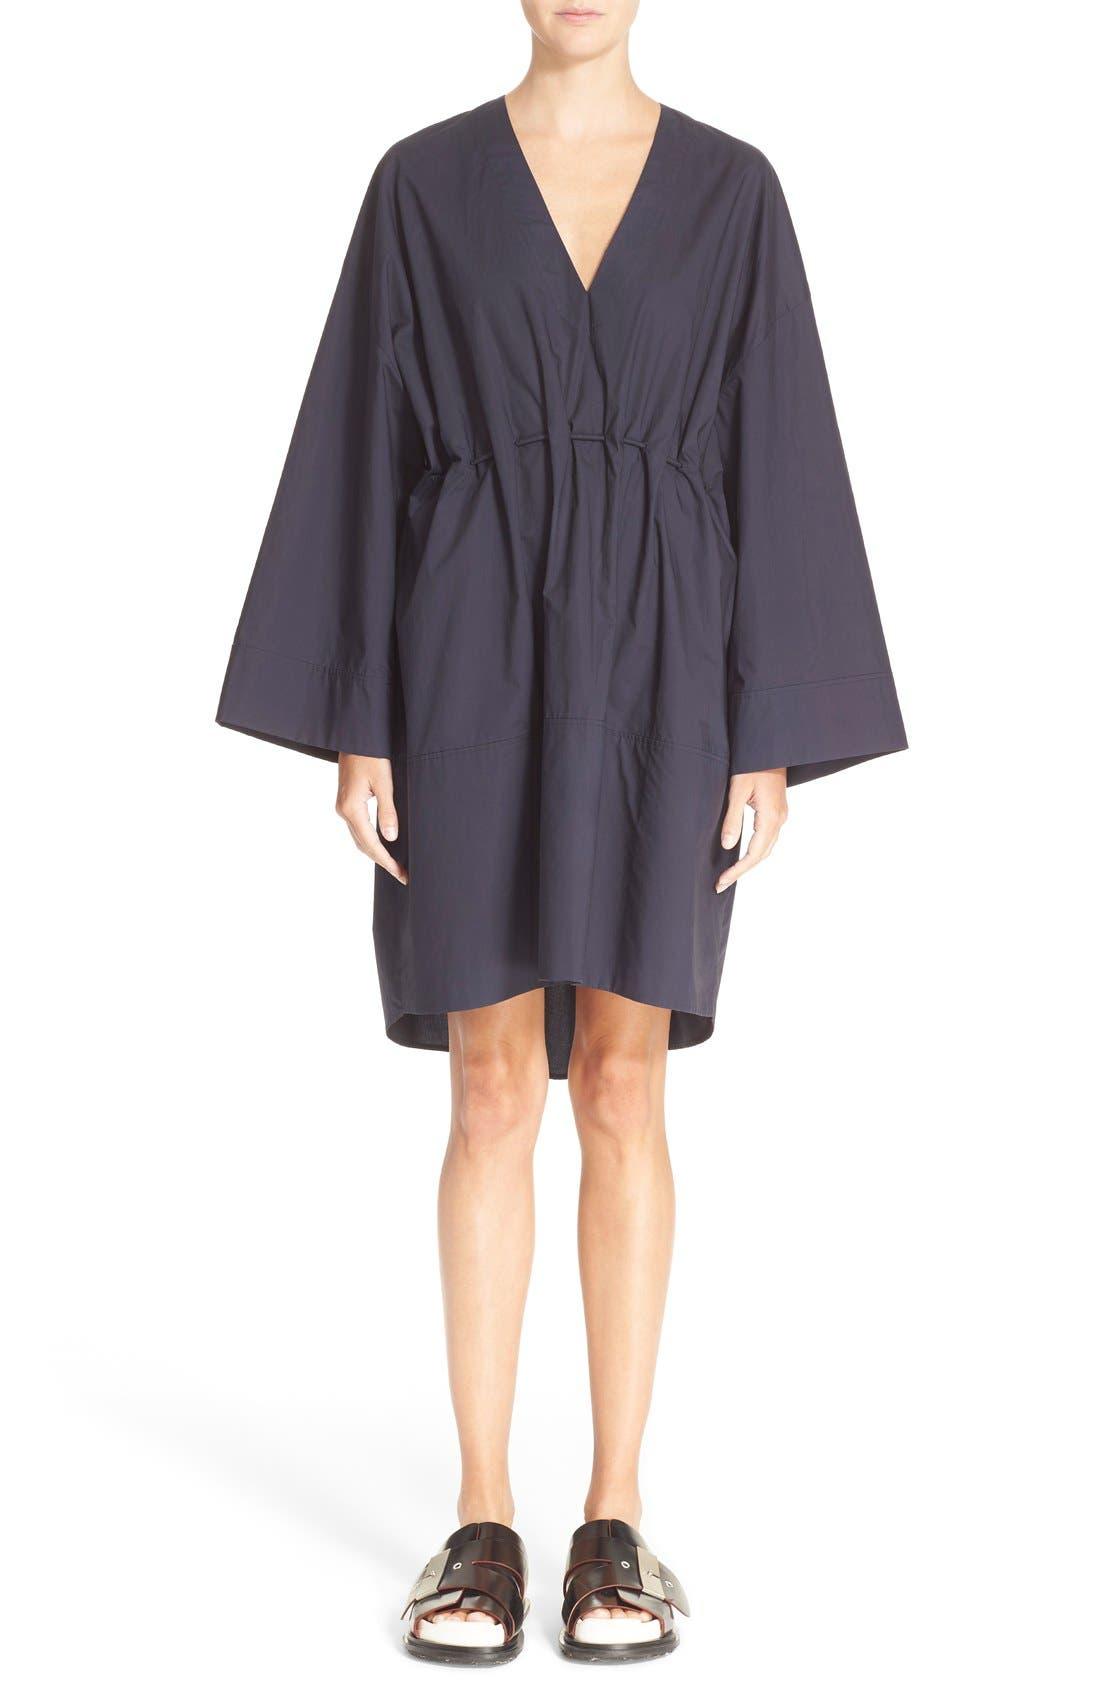 ACNE Studios 'Calida' Cotton Drawstring Dress